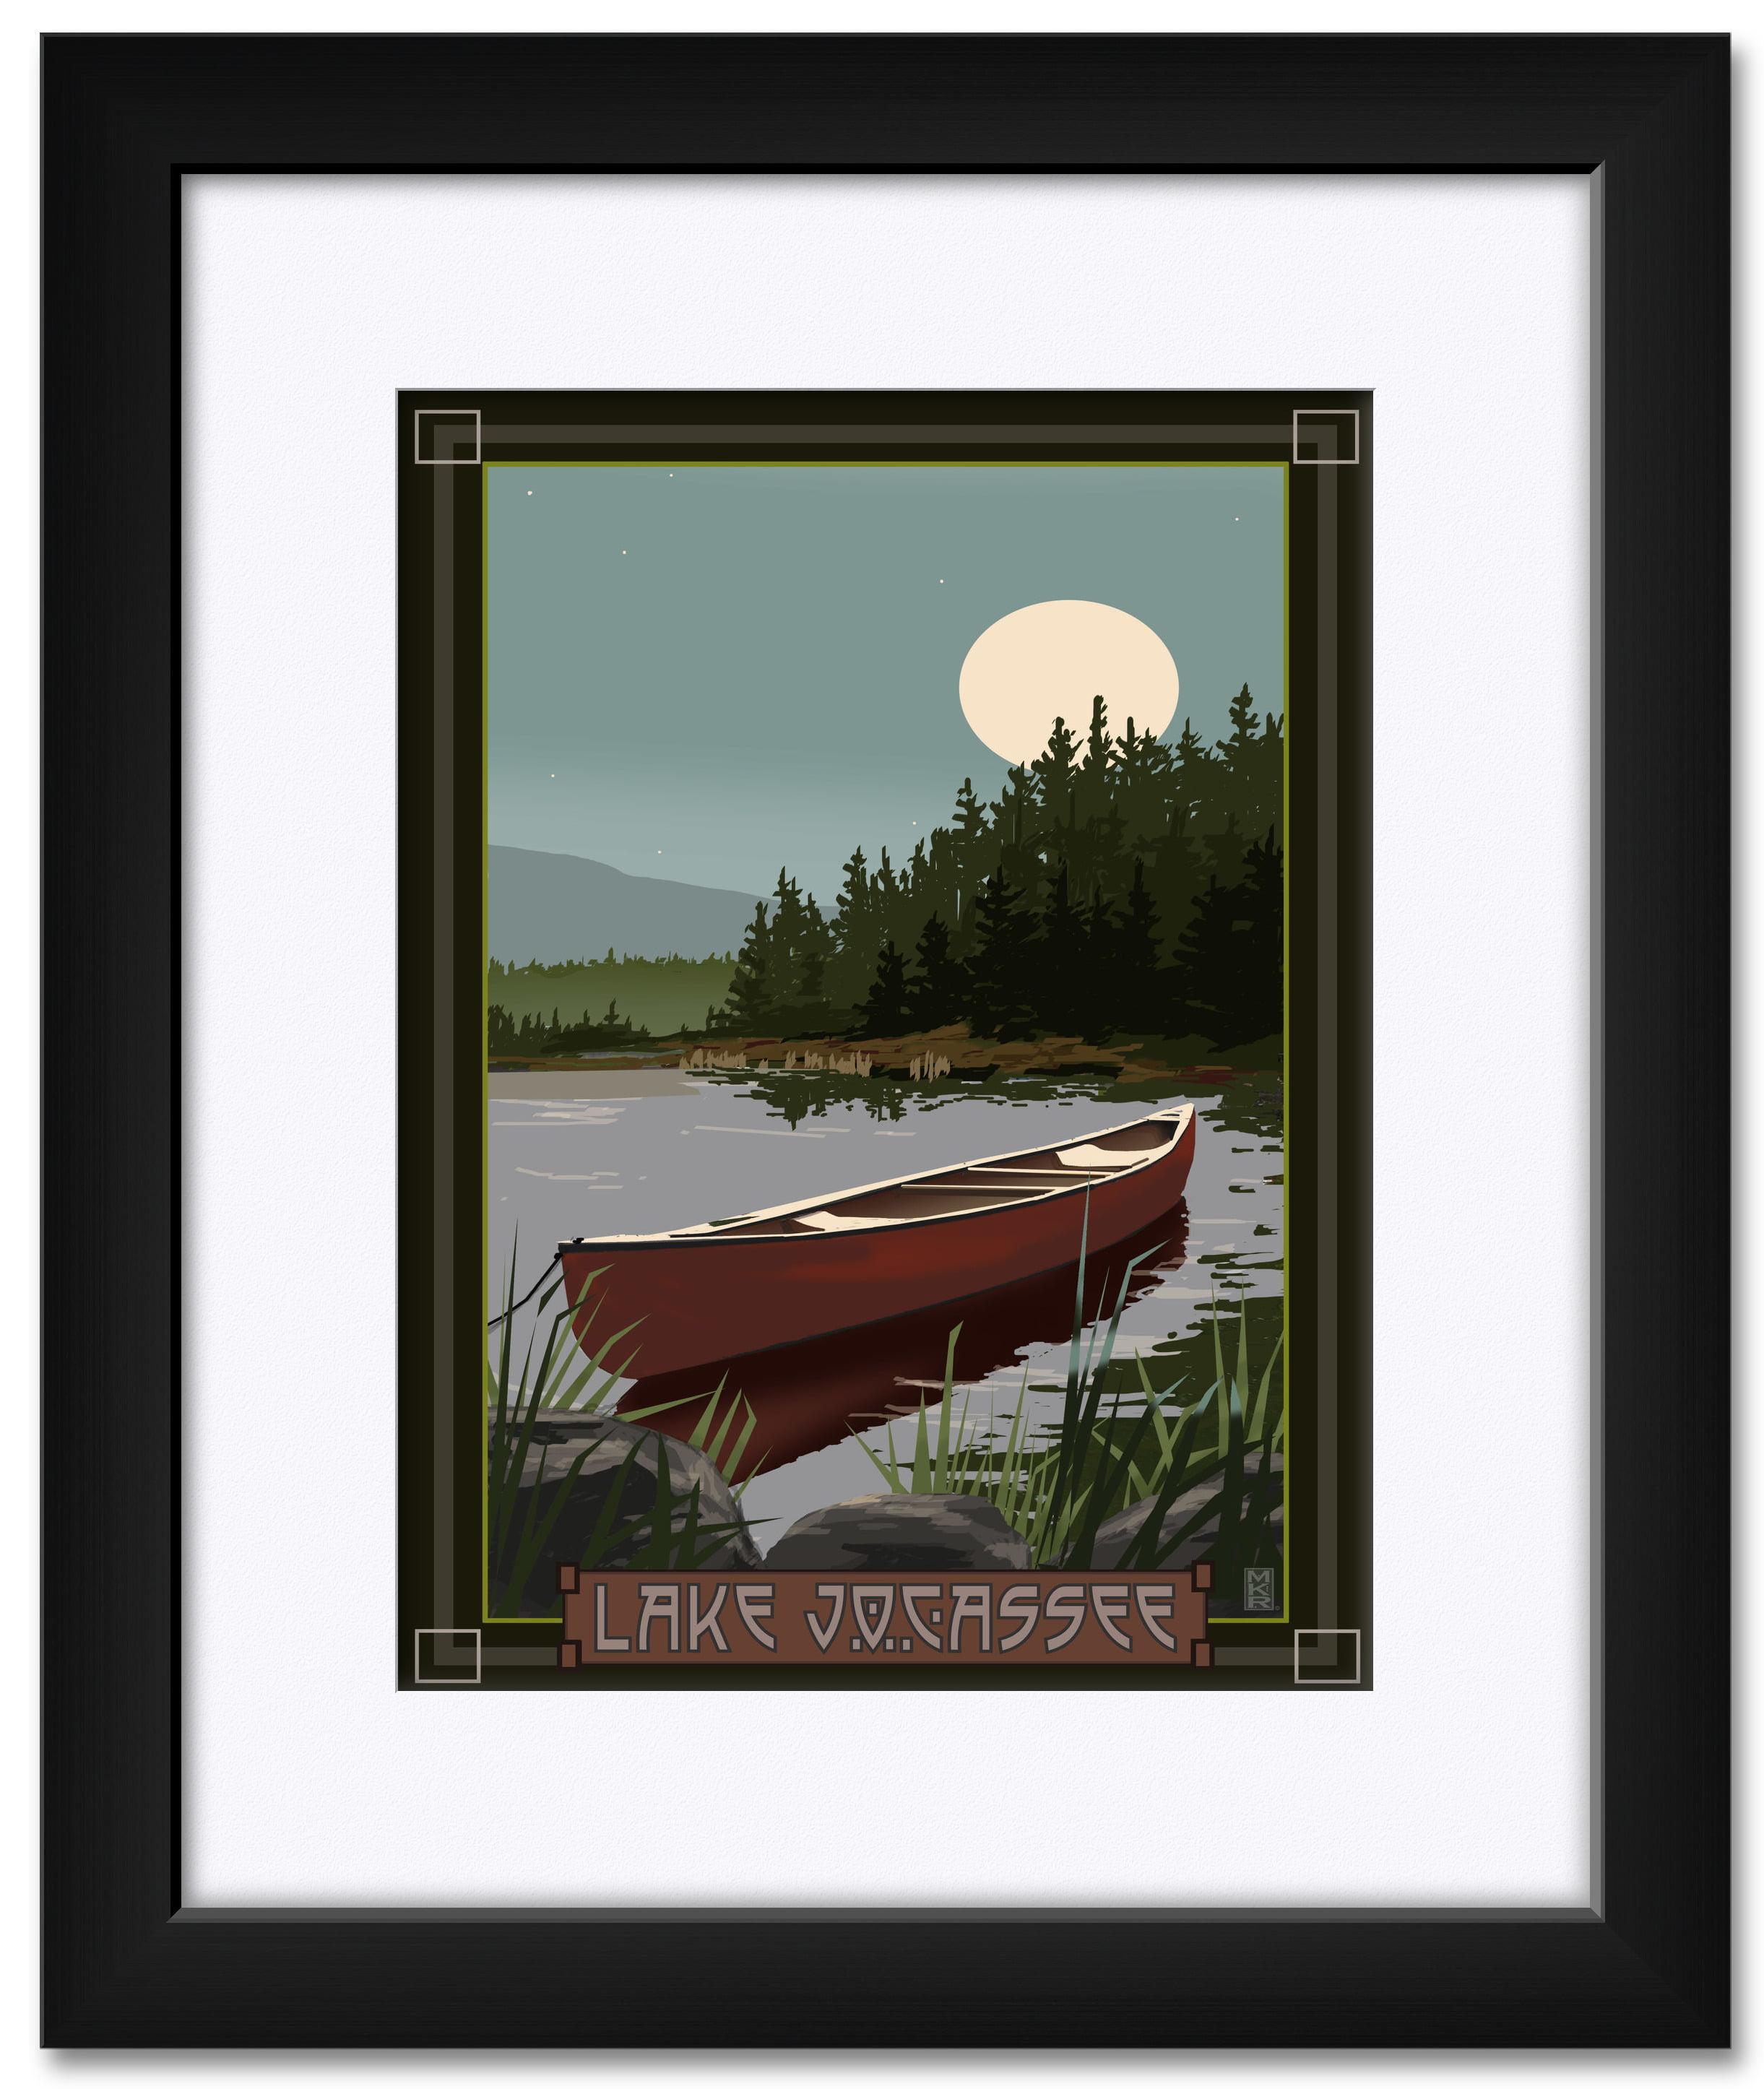 Lake Jocassee South Carolina Canoe In Moonlight Framed Matted Art